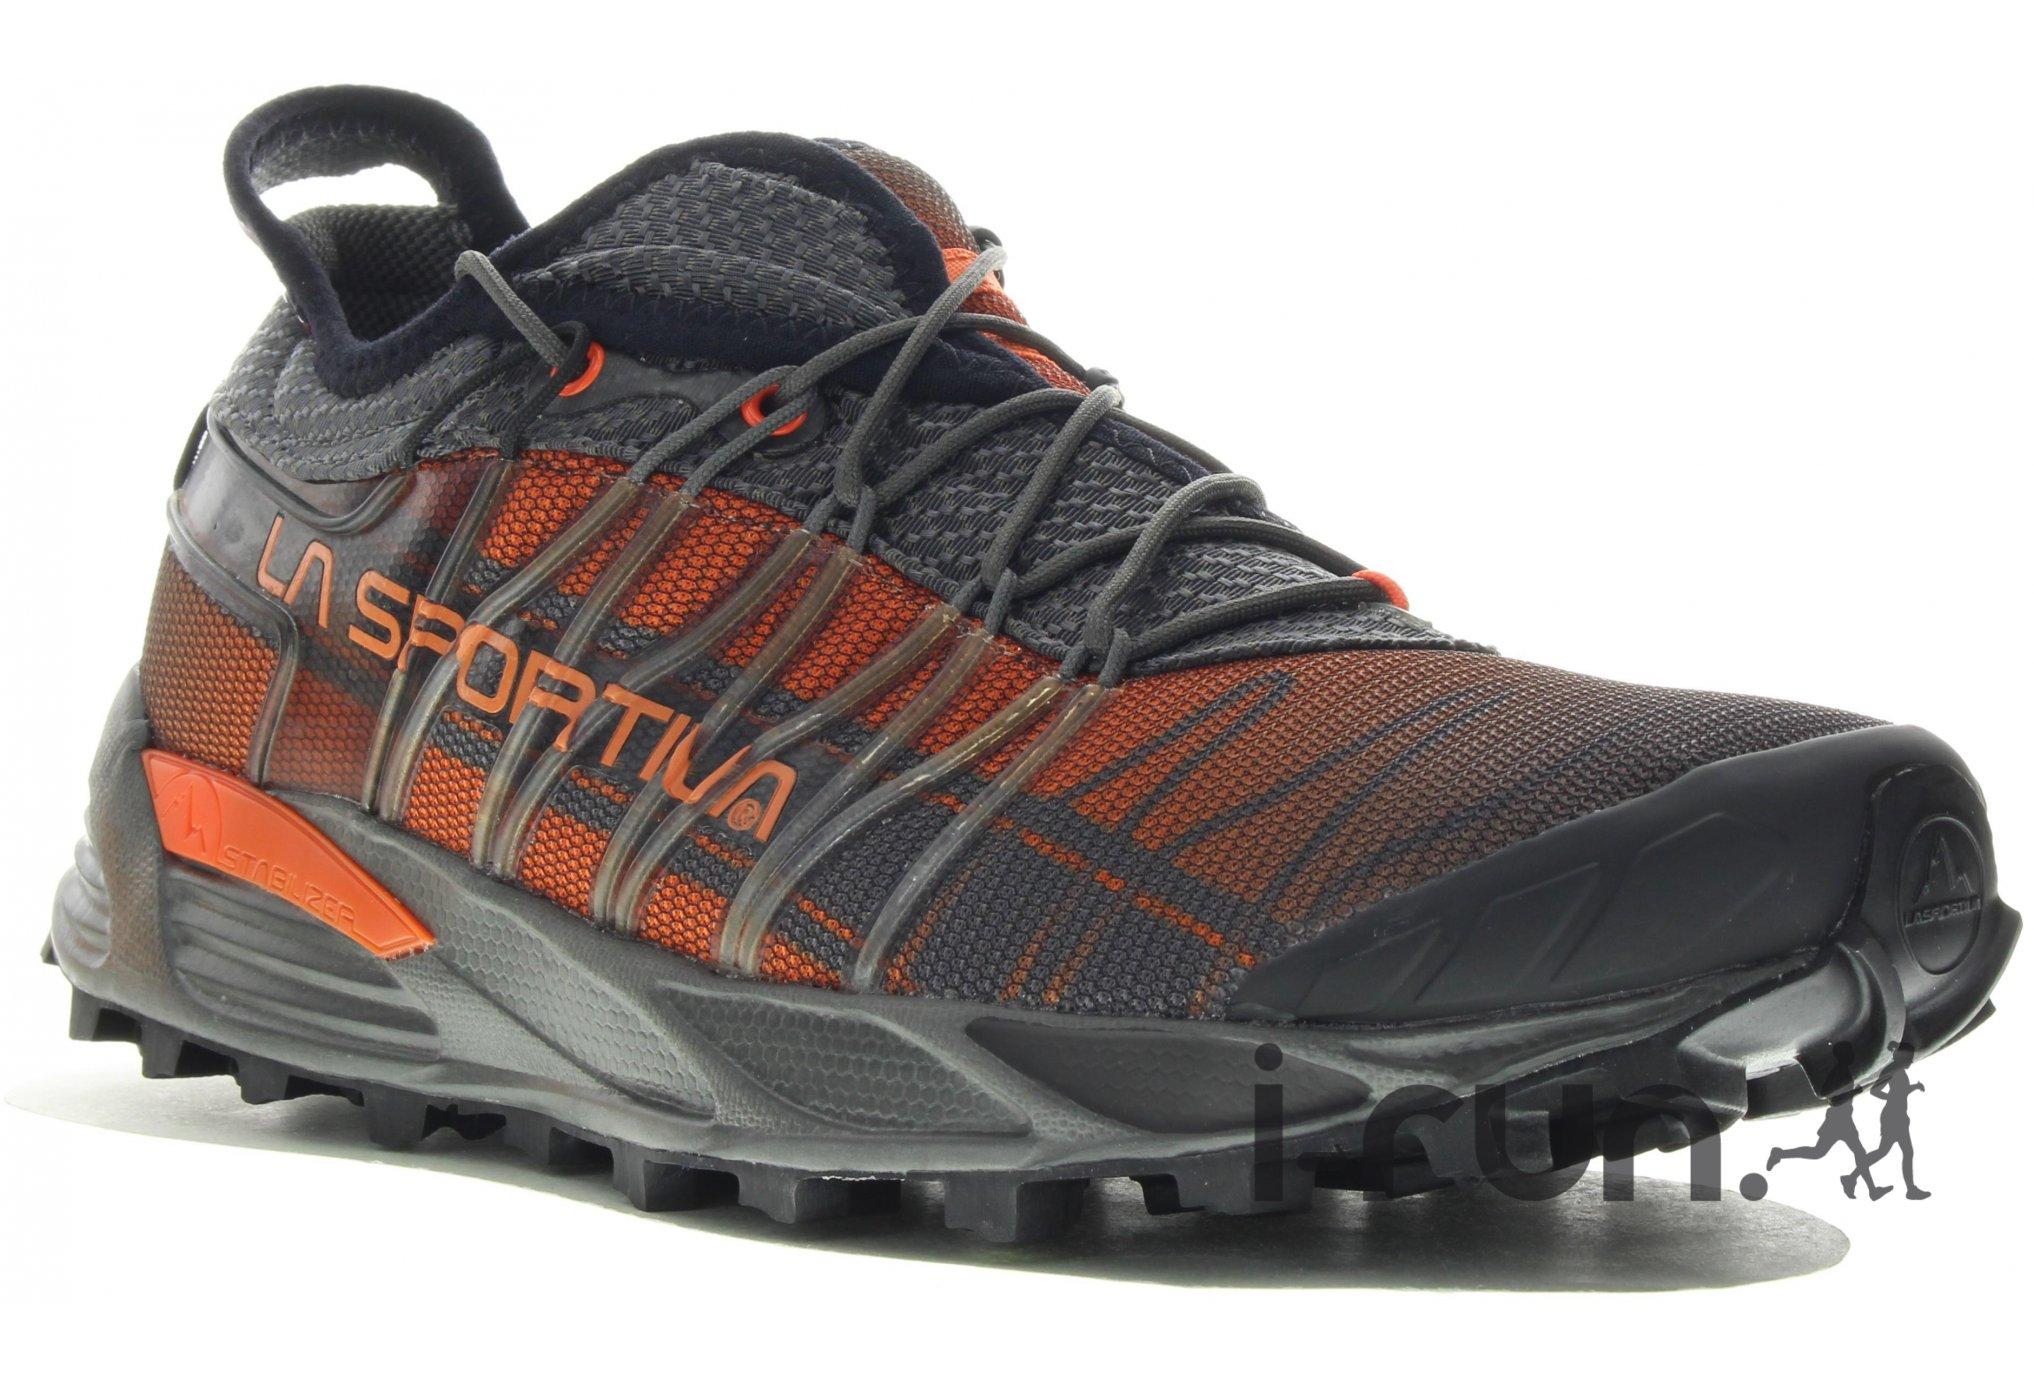 a9d7fd126 La Sportiva Mutant  Características - Zapatillas Running